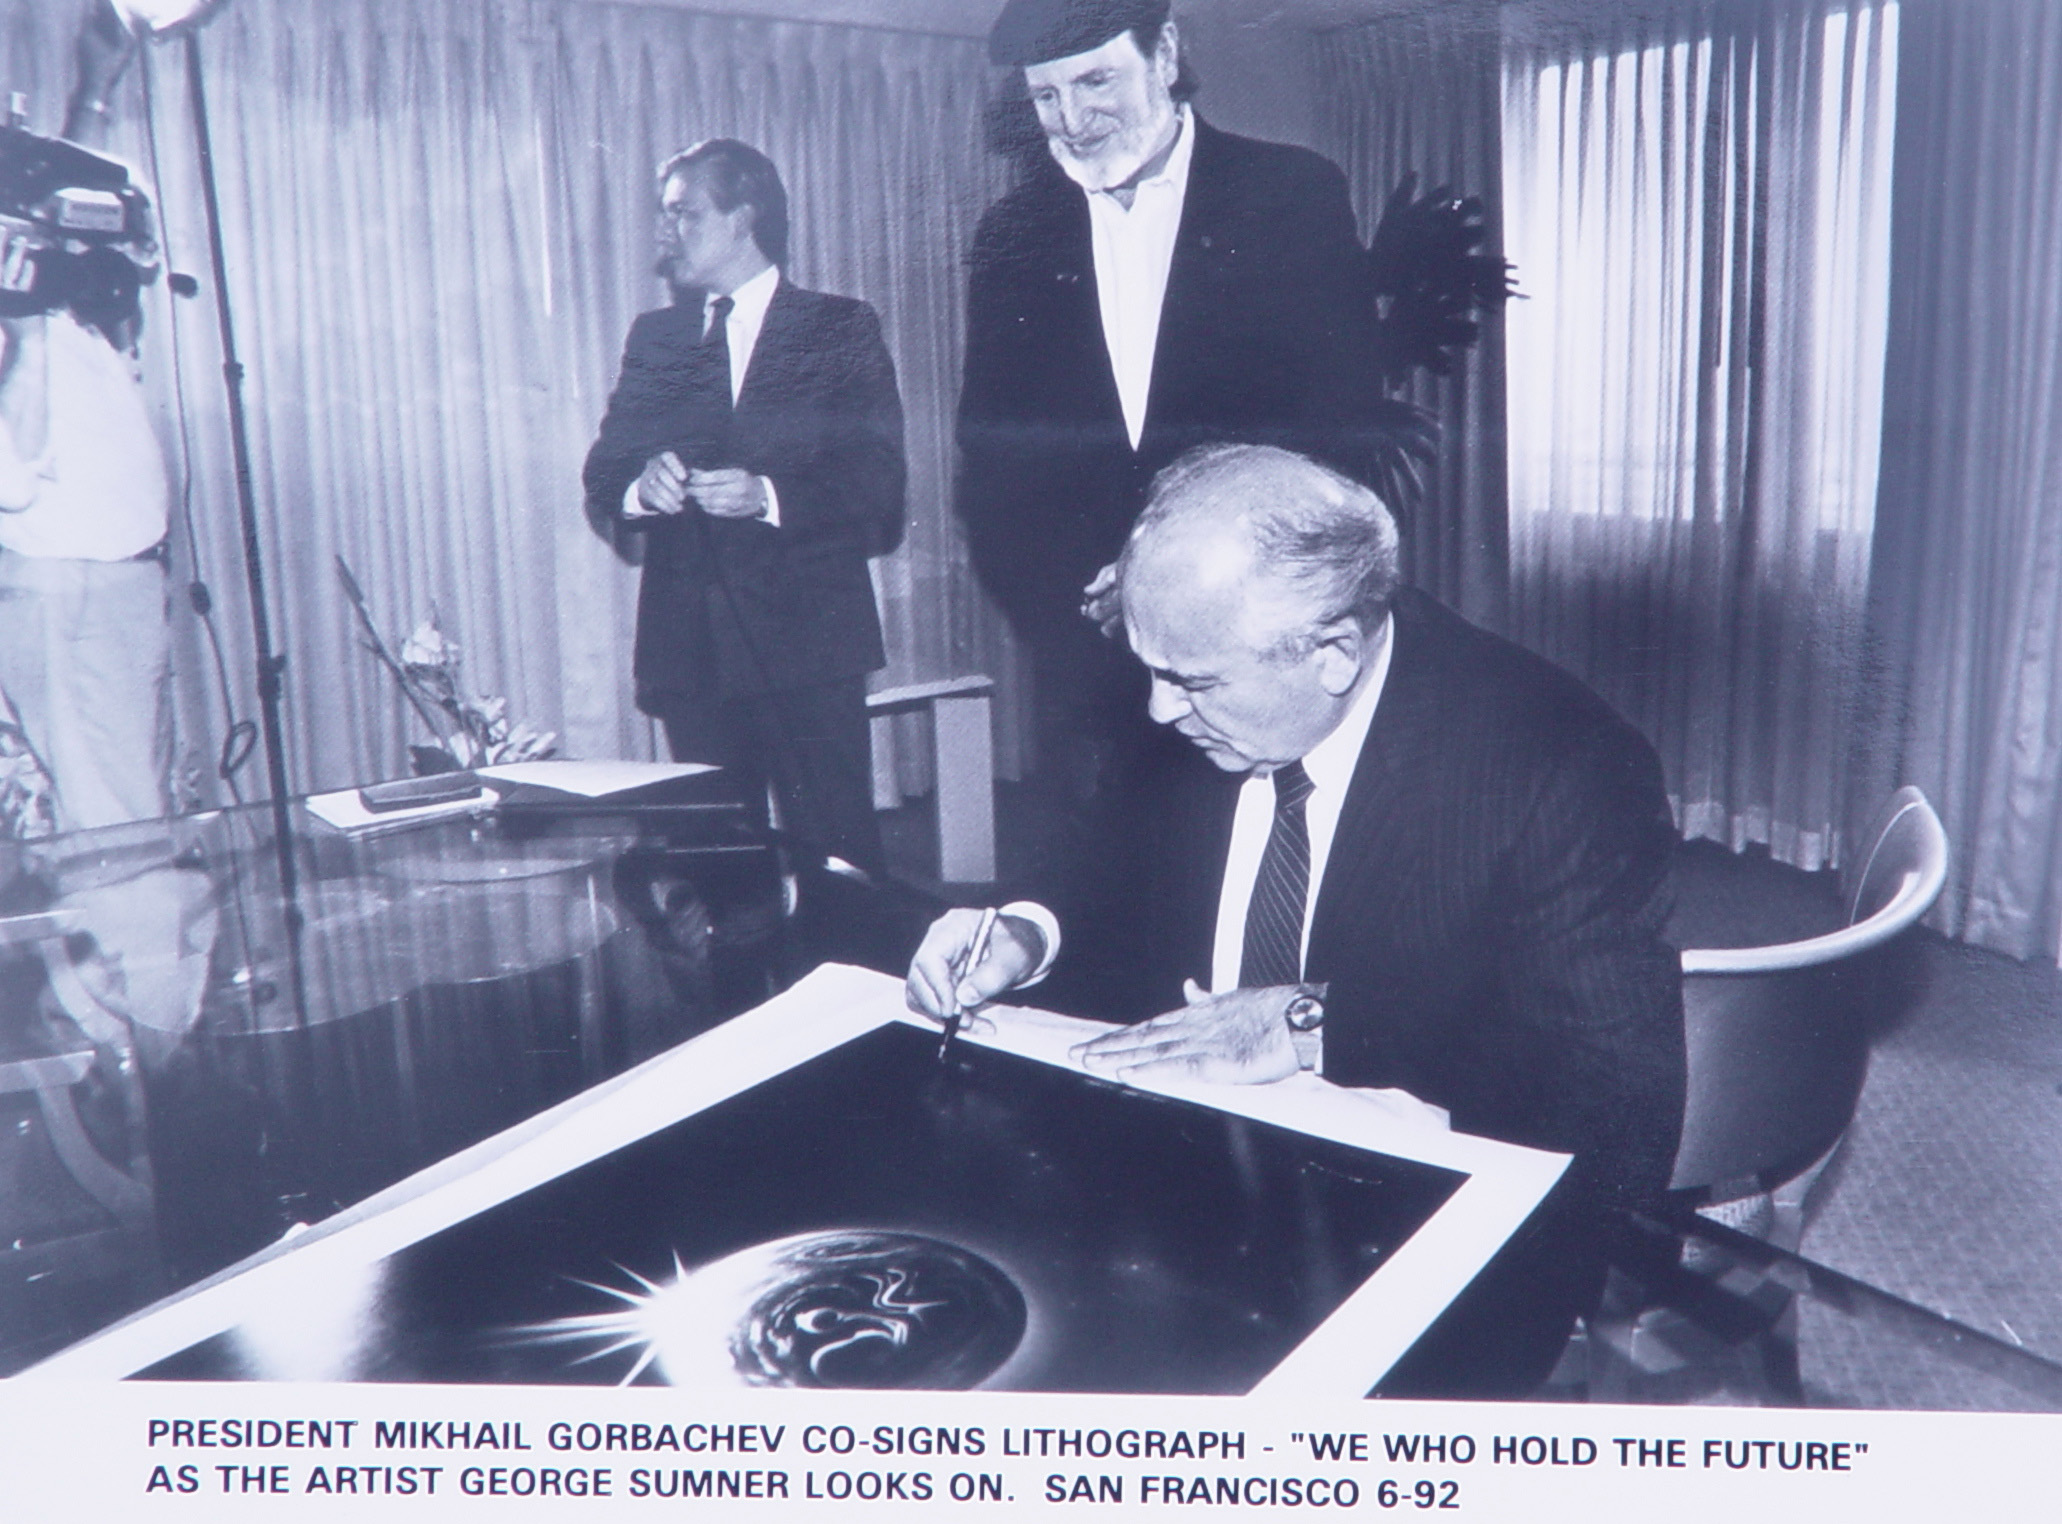 President Gorbachev & George Sumner